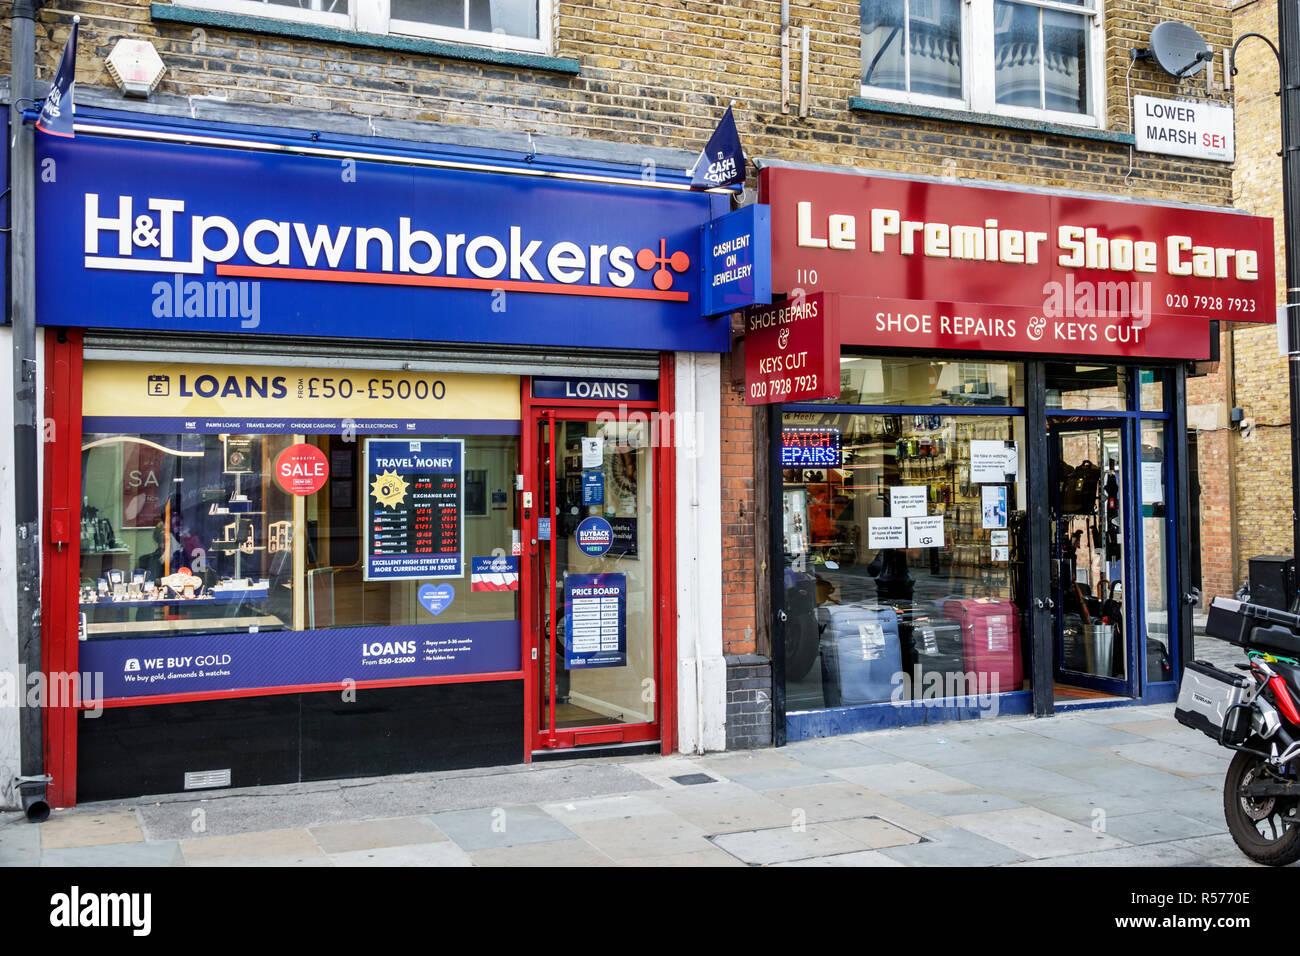 United Kingdom Great Britain England London Lambeth South Bank Lower Marsh neighborhood business store pawnbrokers shoe repair - Stock Image